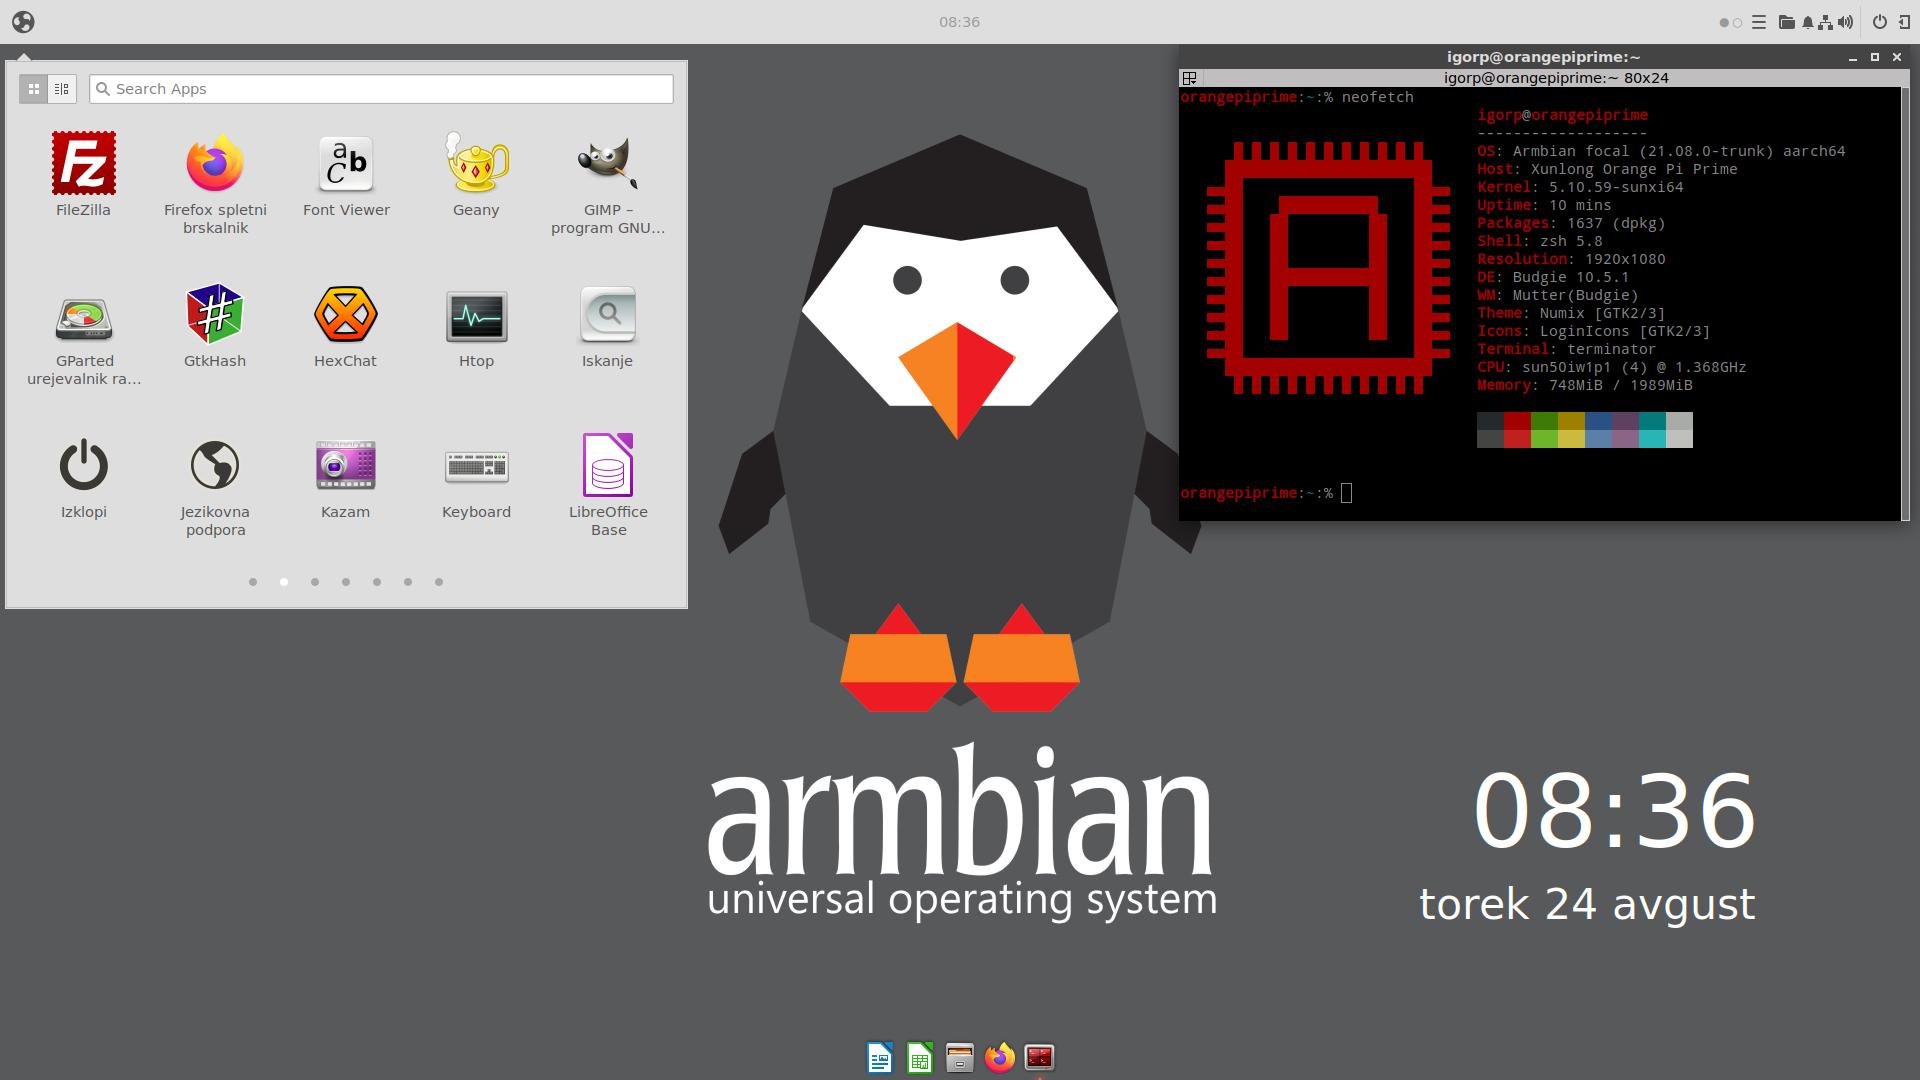 Armbian Budgie desktop